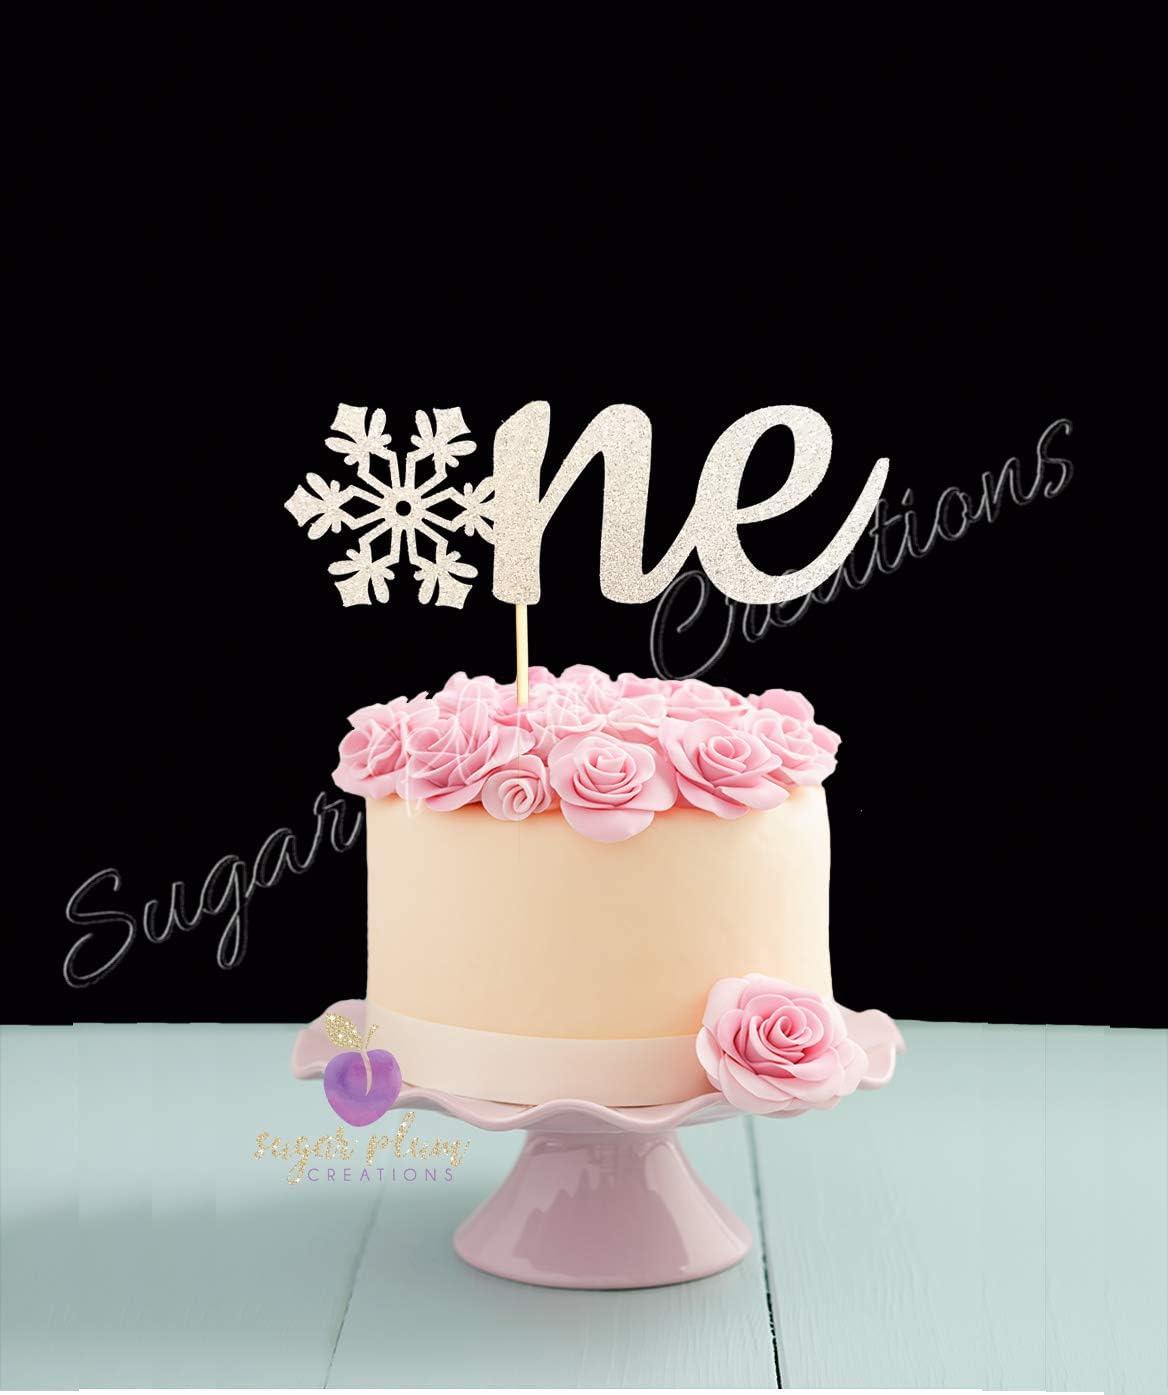 Incredible Amazon Com Sugar Plum Creations One Snowflake Birthday Cake Funny Birthday Cards Online Fluifree Goldxyz